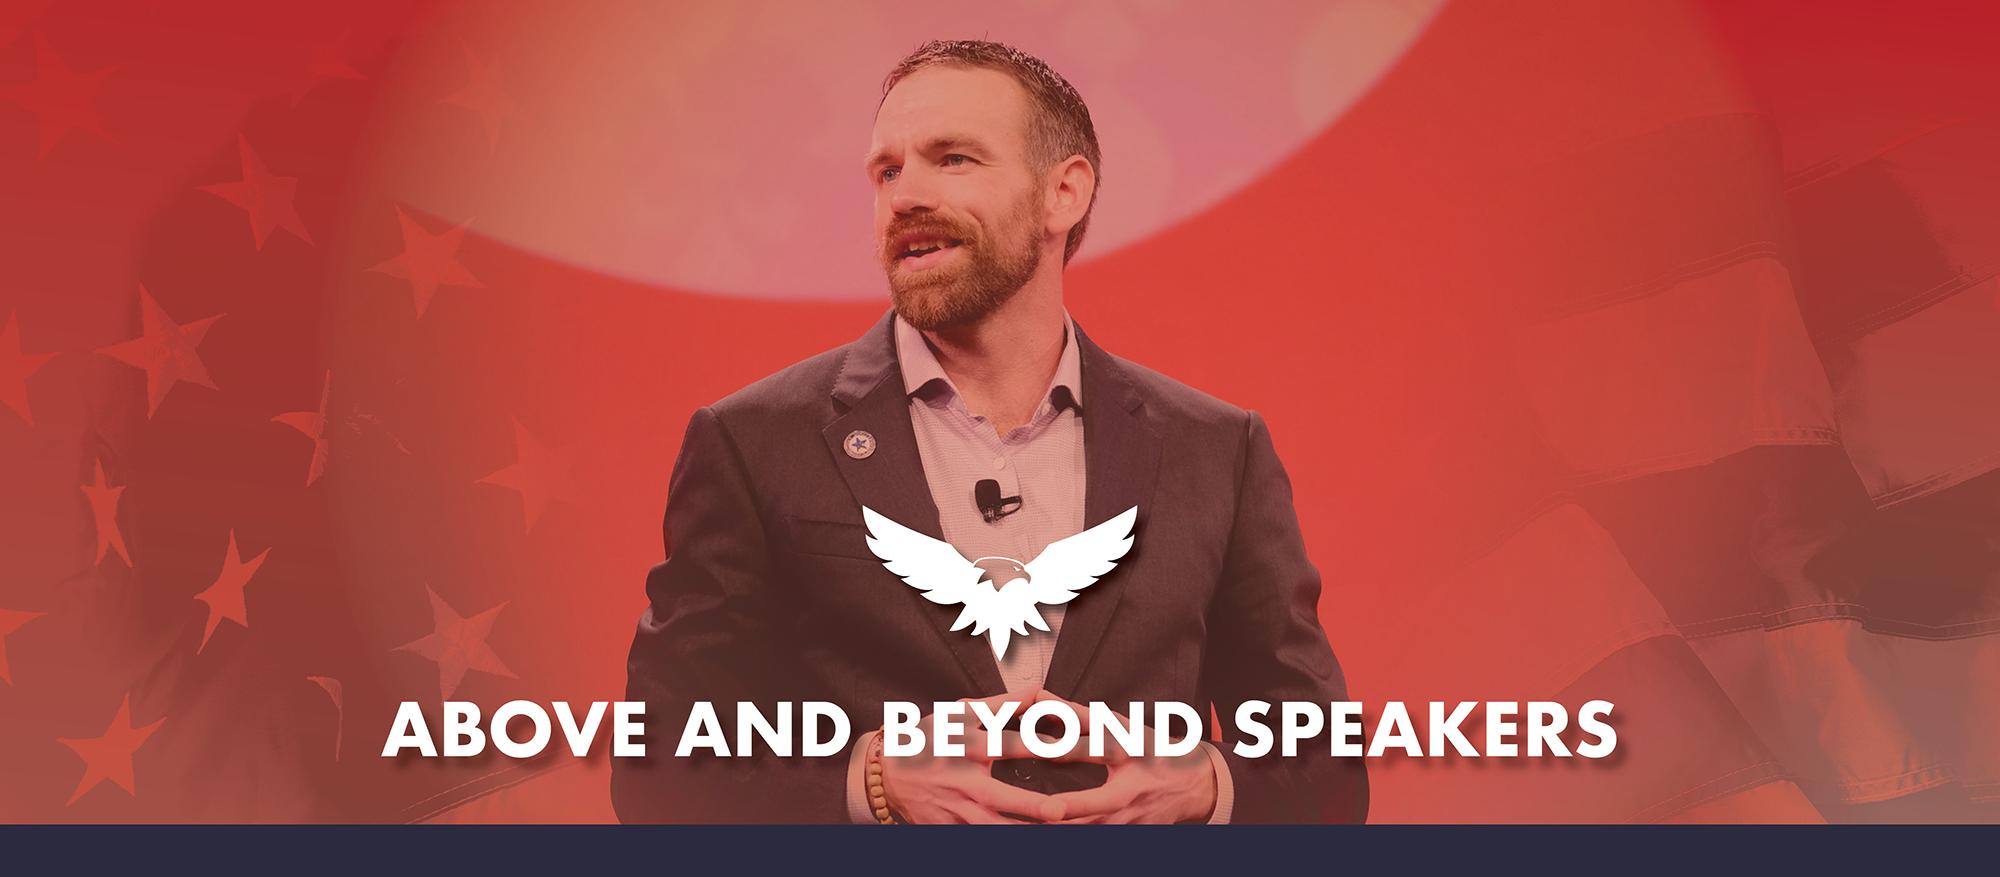 keynote-speaker-slide-2